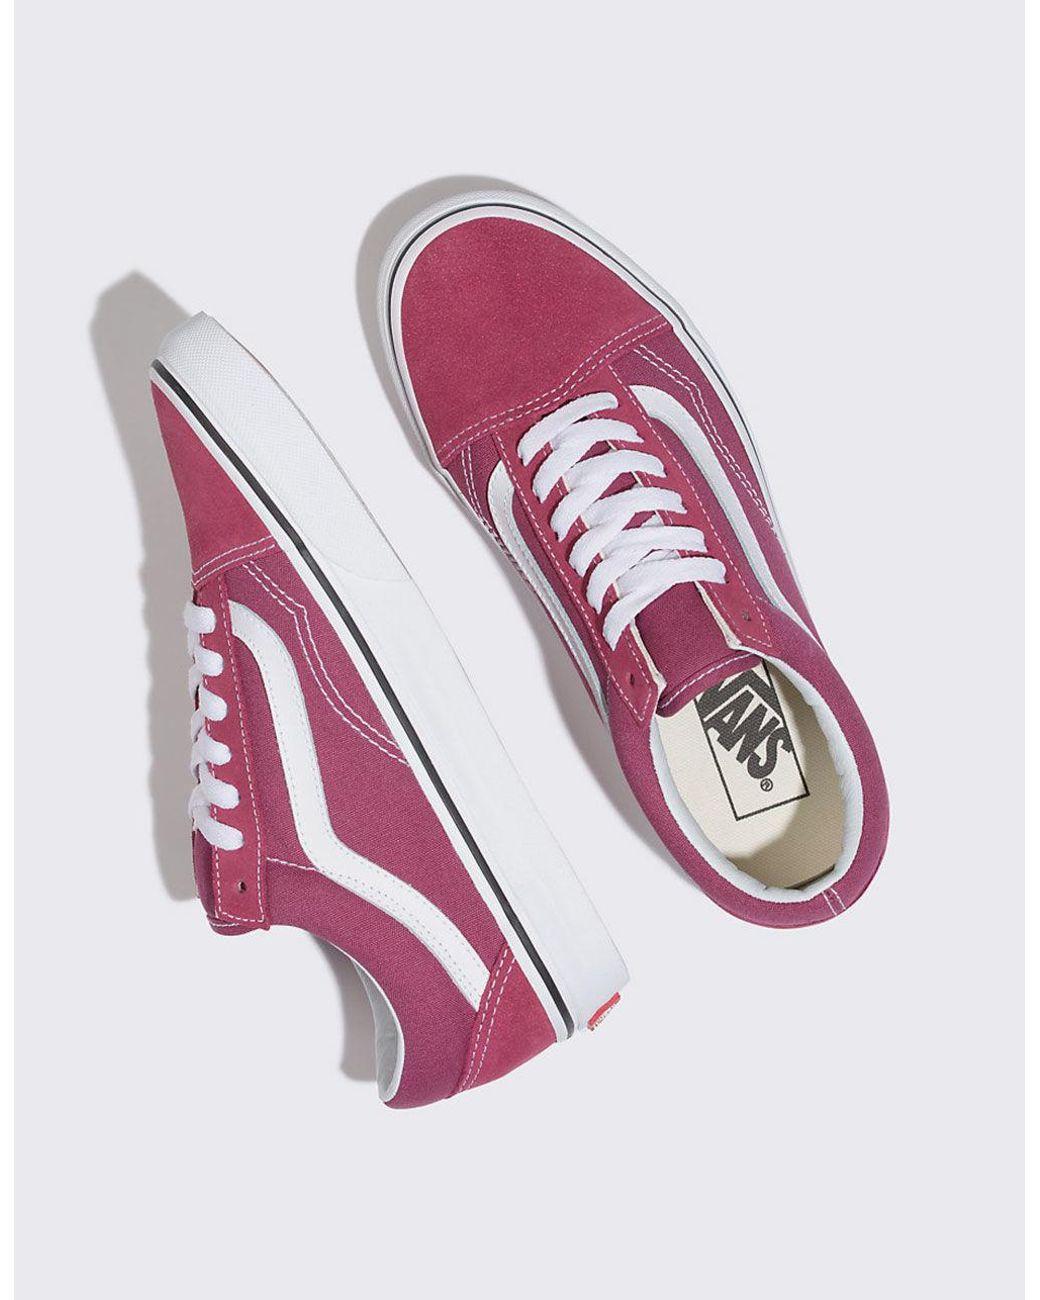 93c6dc26b586cc Lyst - Vans Old Skool Dry Rose   True White Womens Shoes - Save 31%